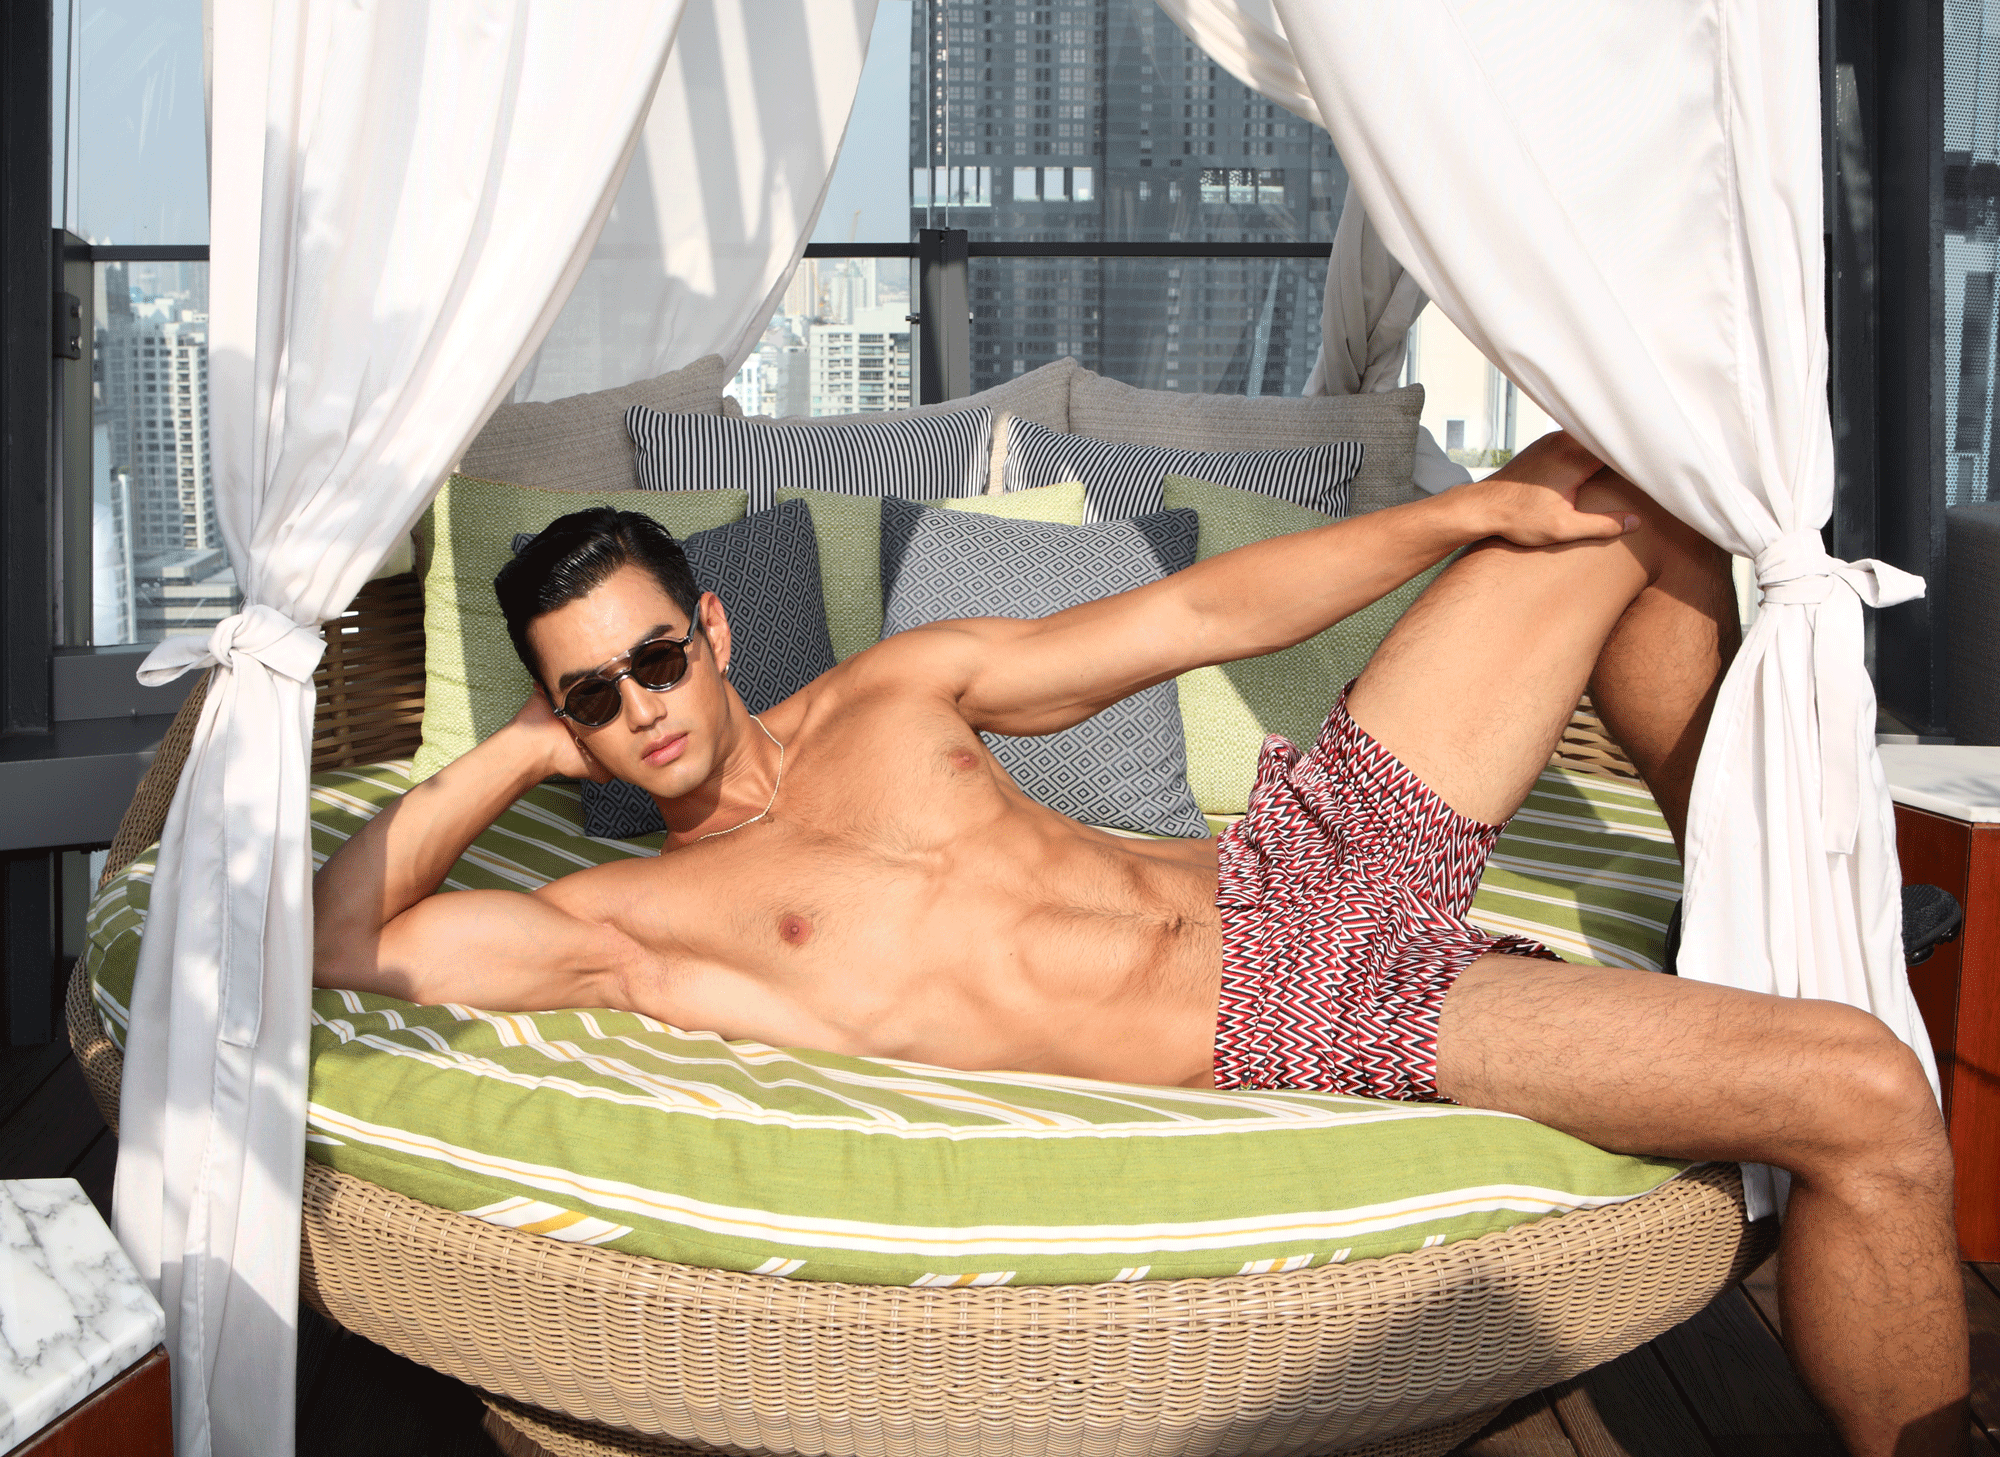 trunks : MISSONI / sunglasses : Blake Kuwahara